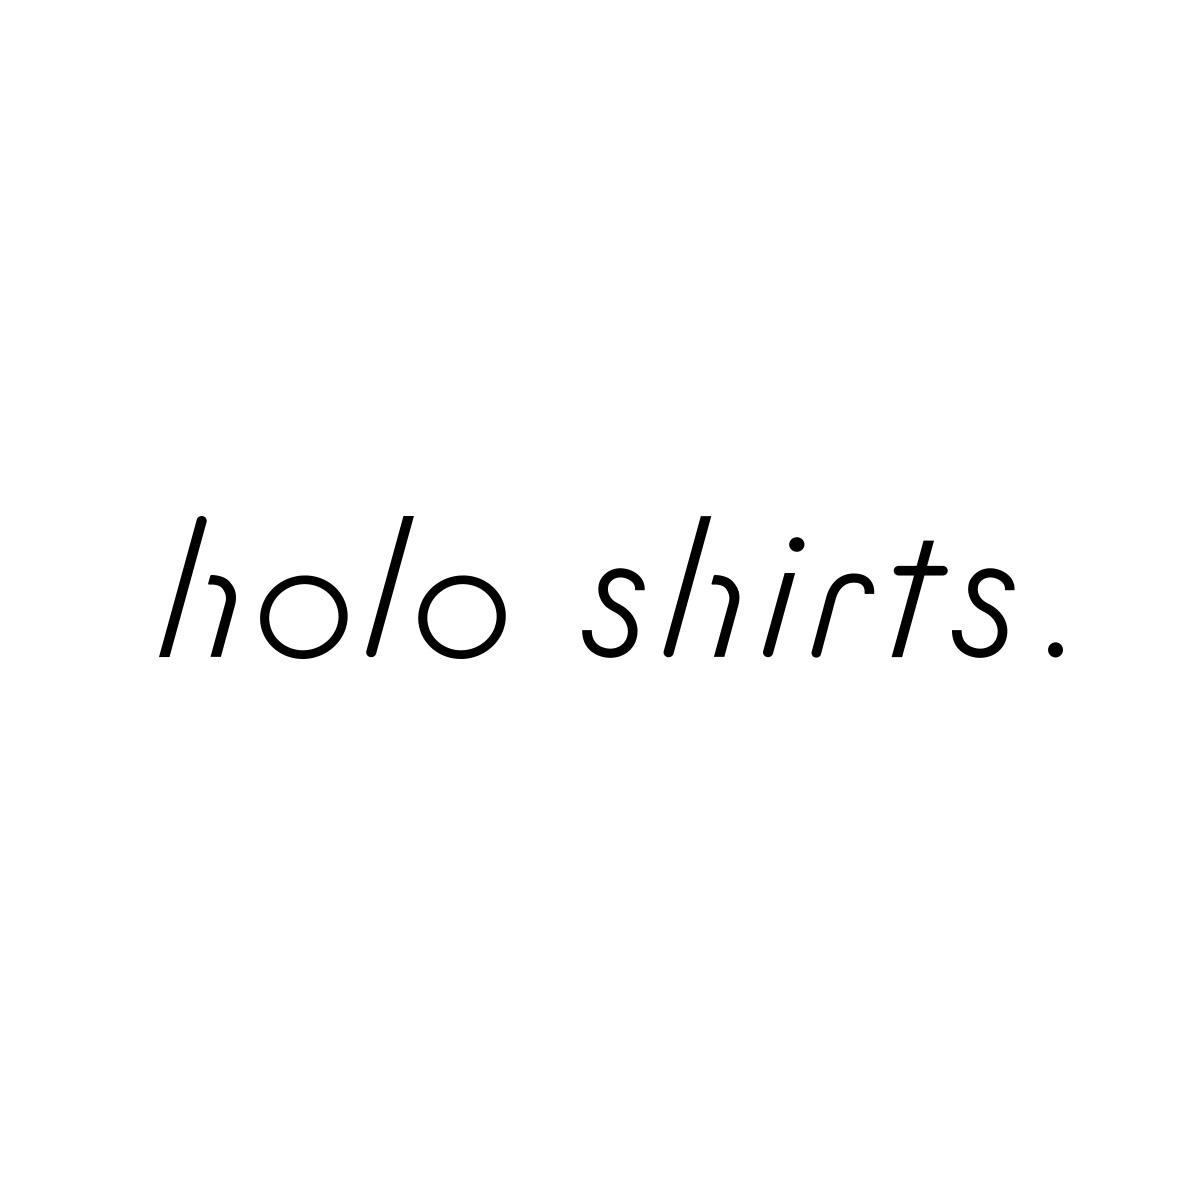 holo shirts.